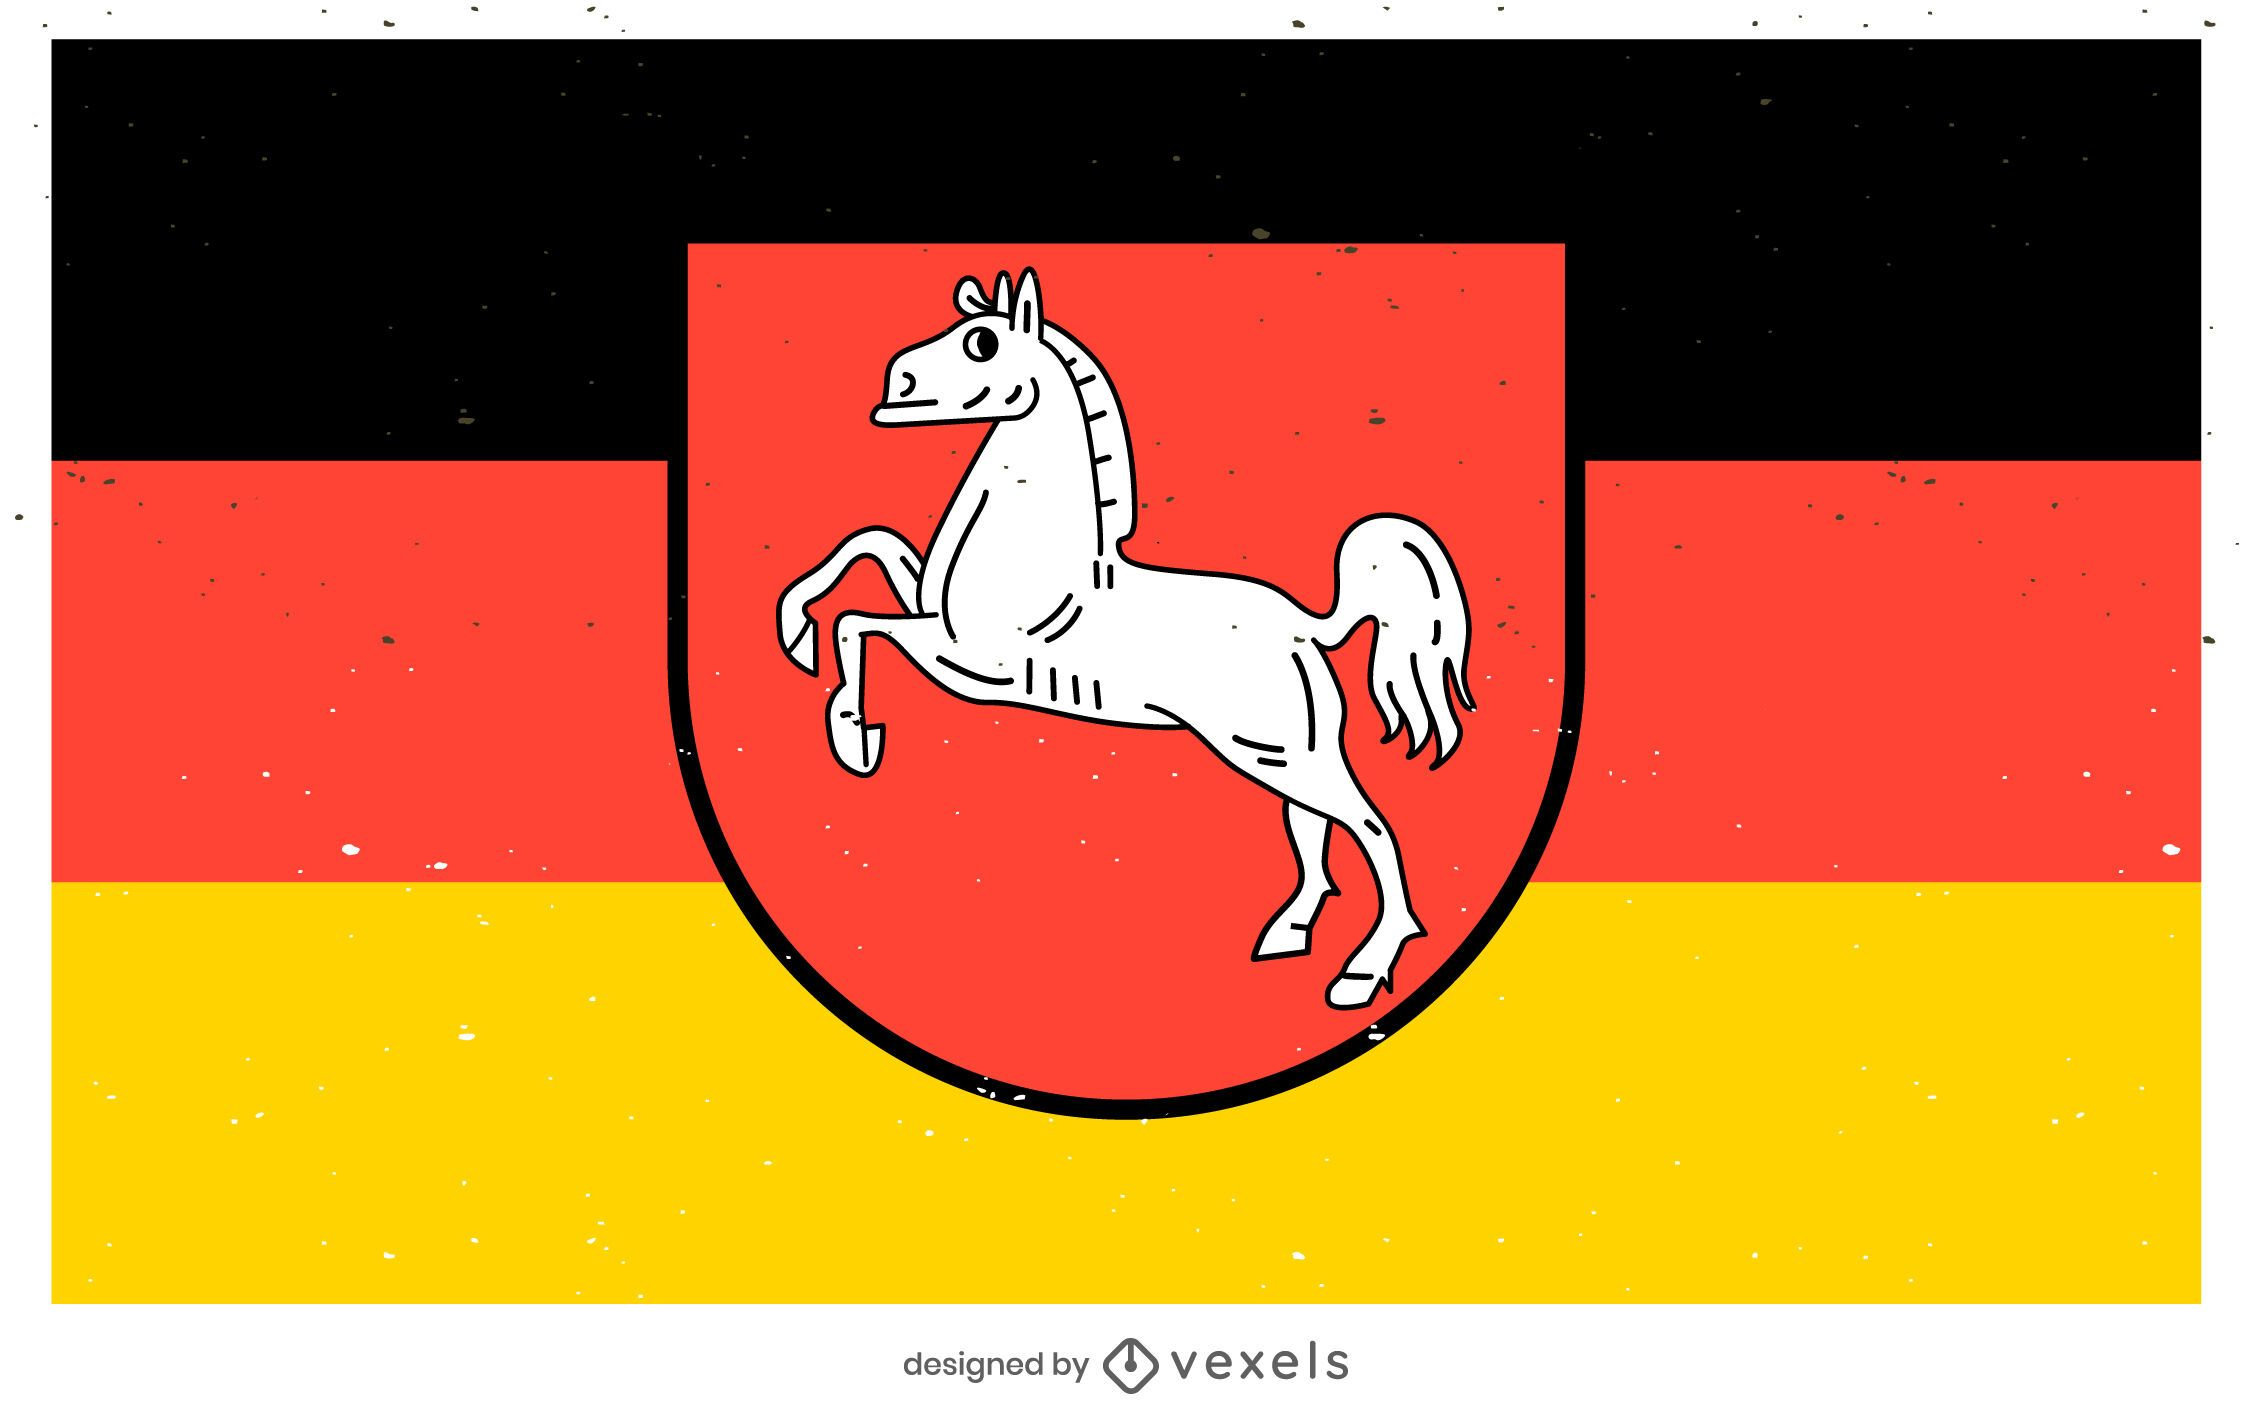 Desenho da bandeira do estado de Niedersachsen